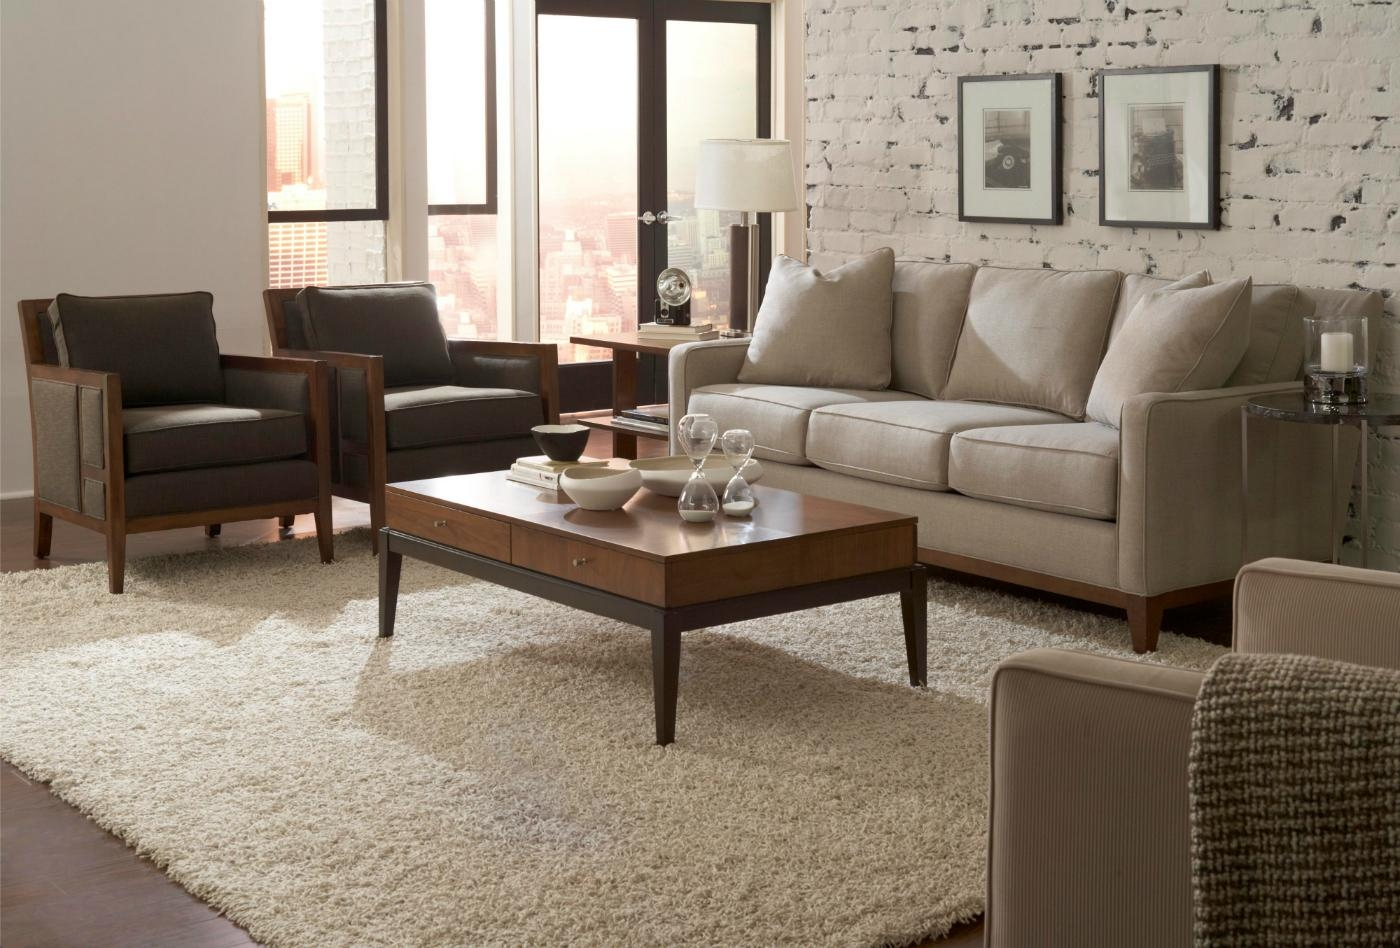 Furniture: Broyhill Furniture | Broyhill Fontana Sofa | Broyhill Sofas Pertaining To Broyhill Mckinney Sofas (Image 13 of 20)